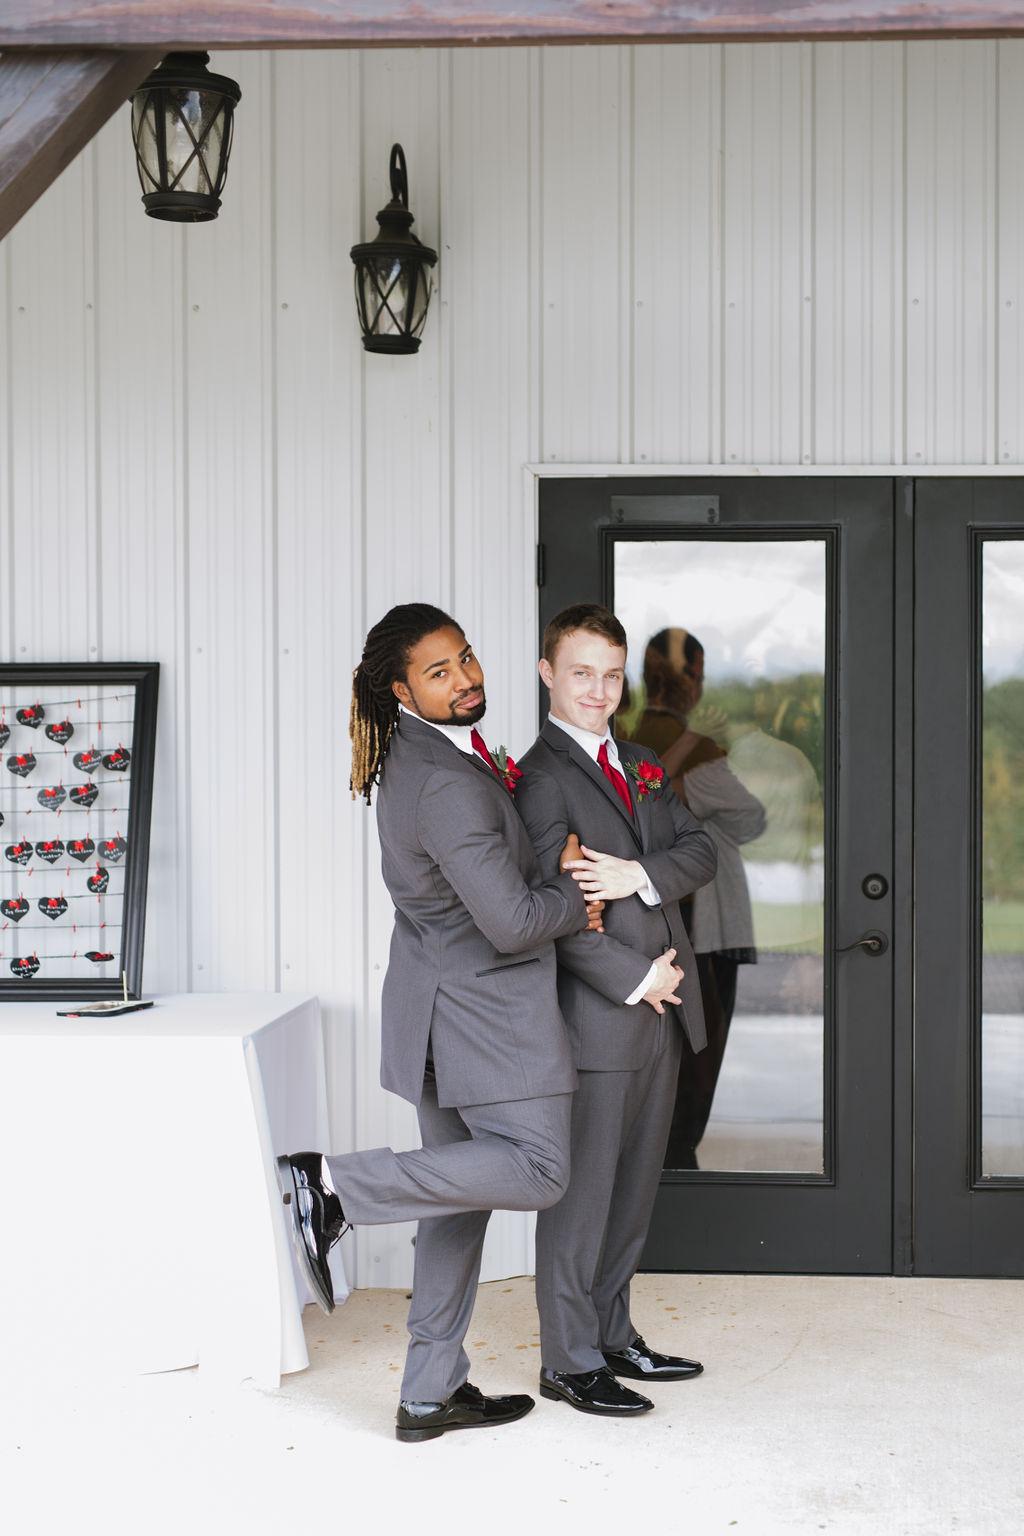 Dream Point Ranch Tulsa White Barn Wedding Venue 36.jpg